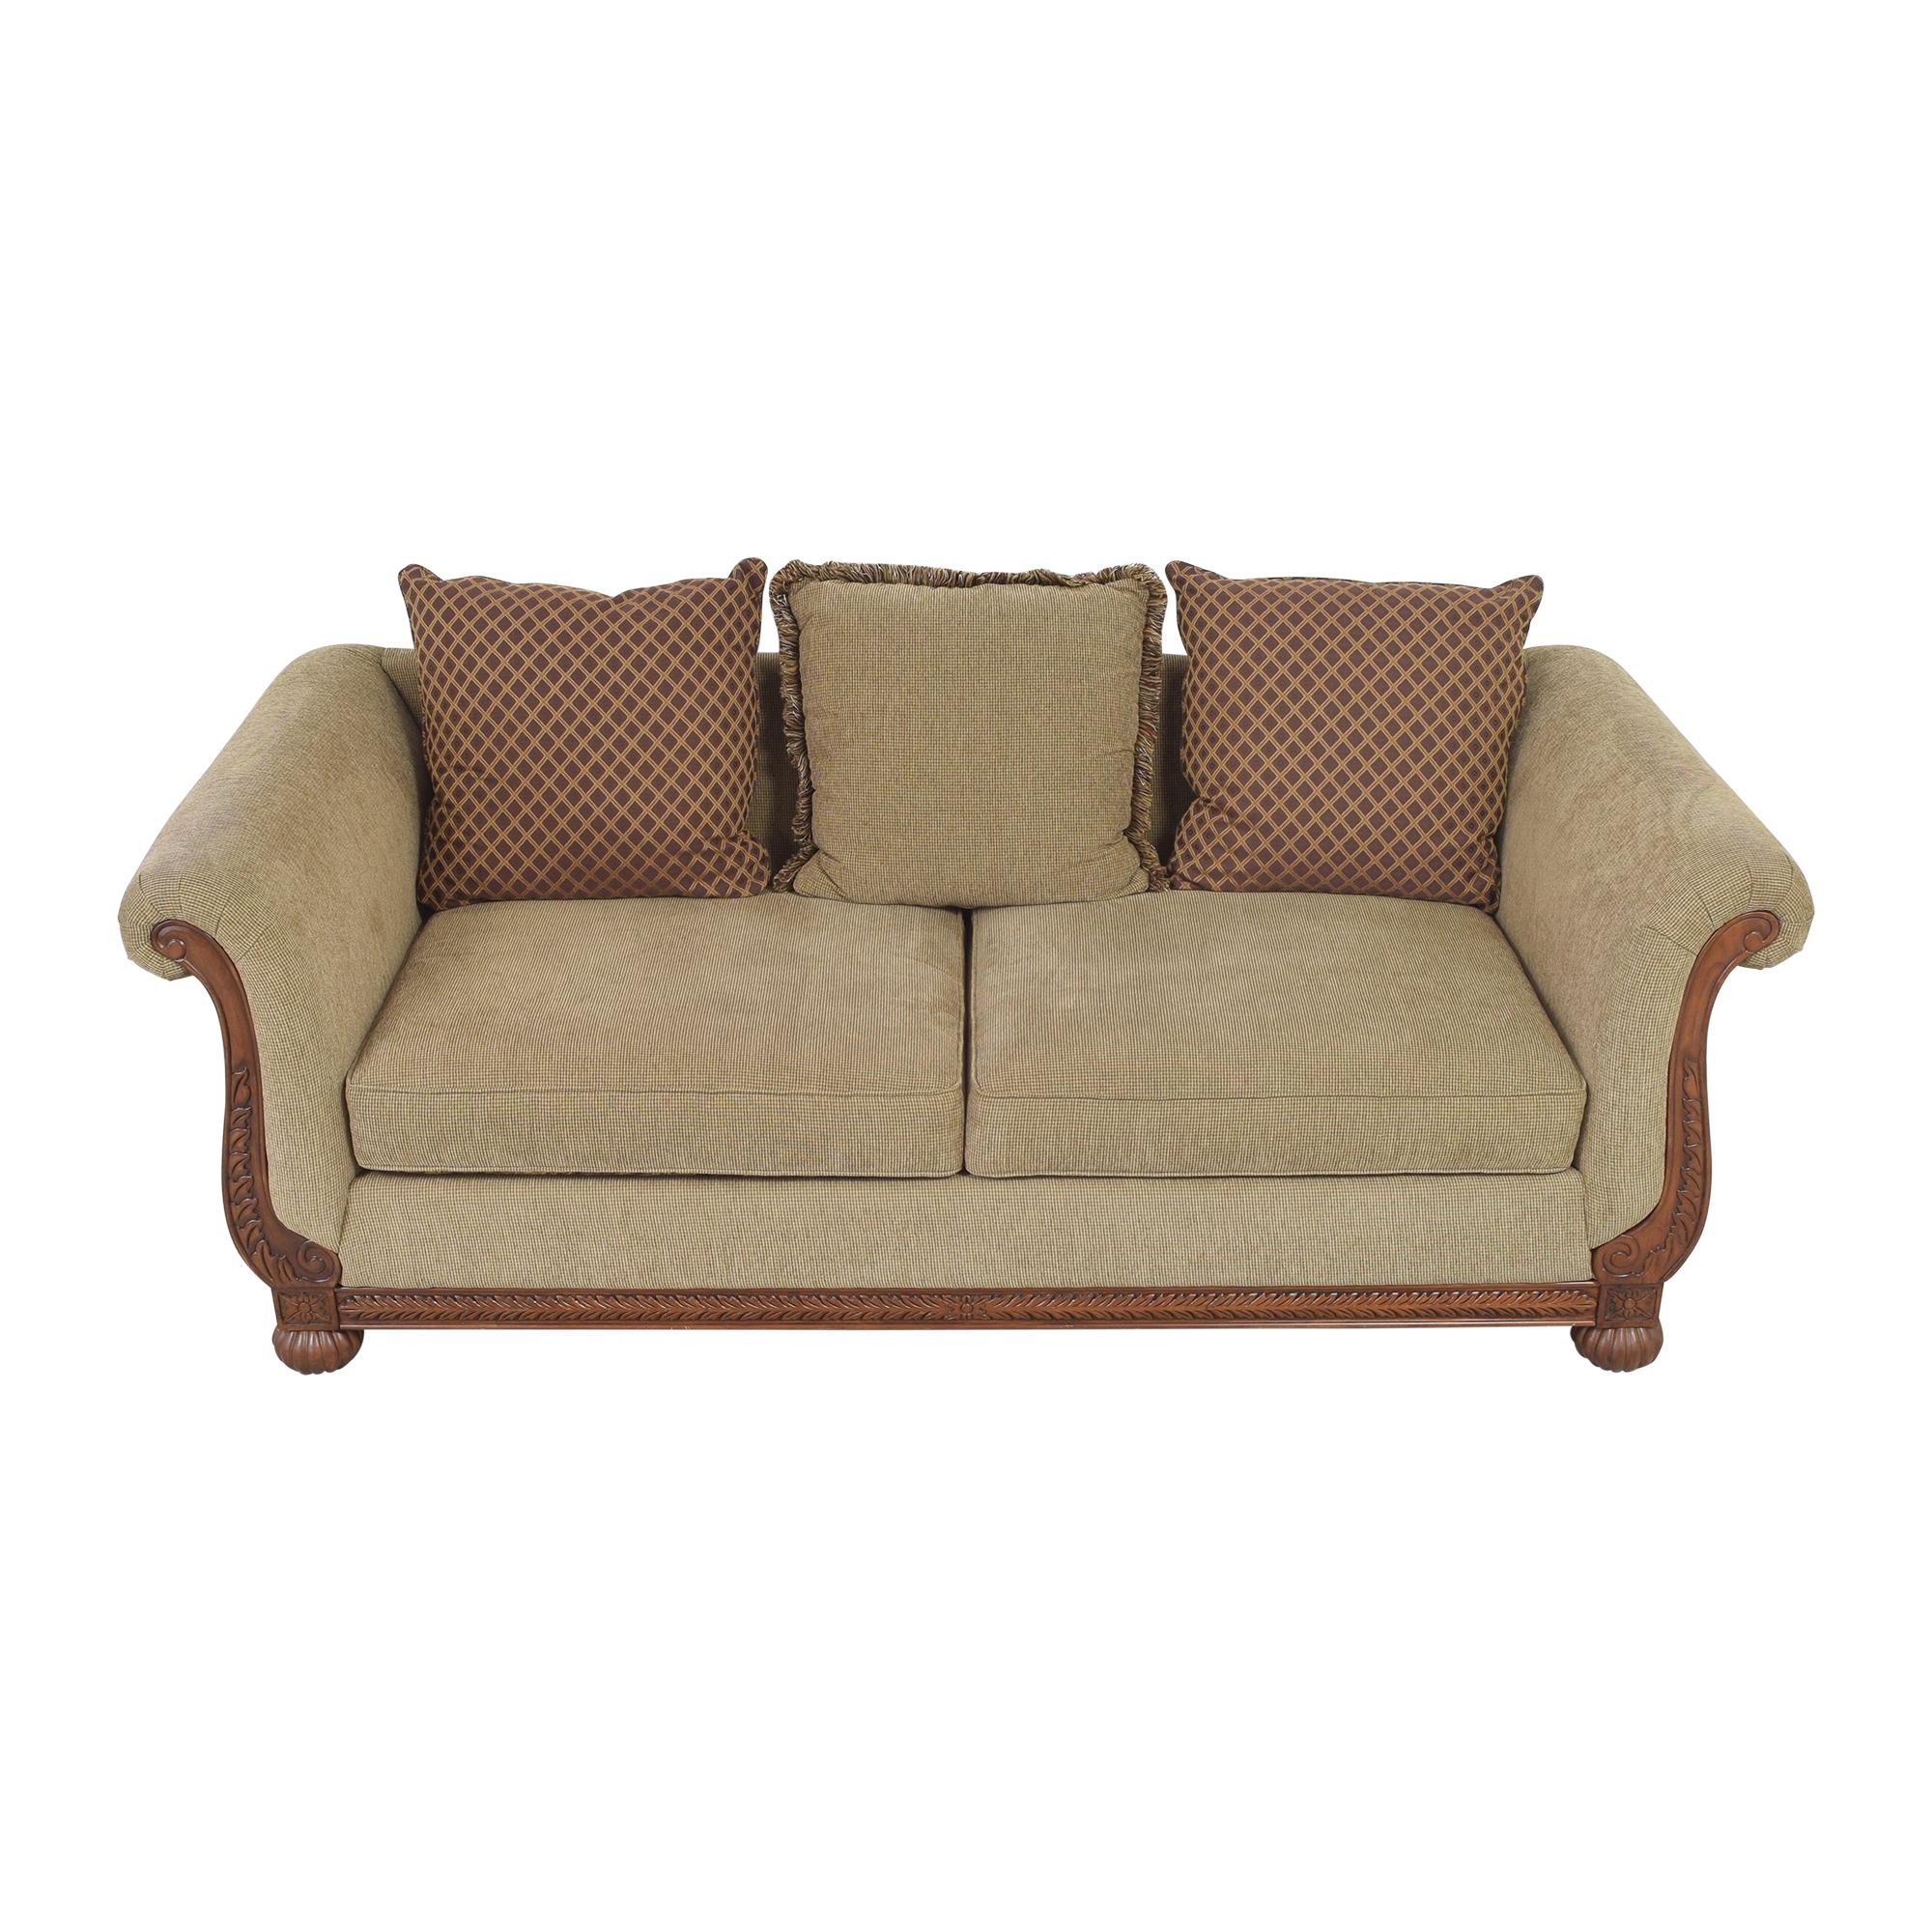 HM Richards Furniture HM Richards Furniture Traditional Roll Arm Sofa dimensions